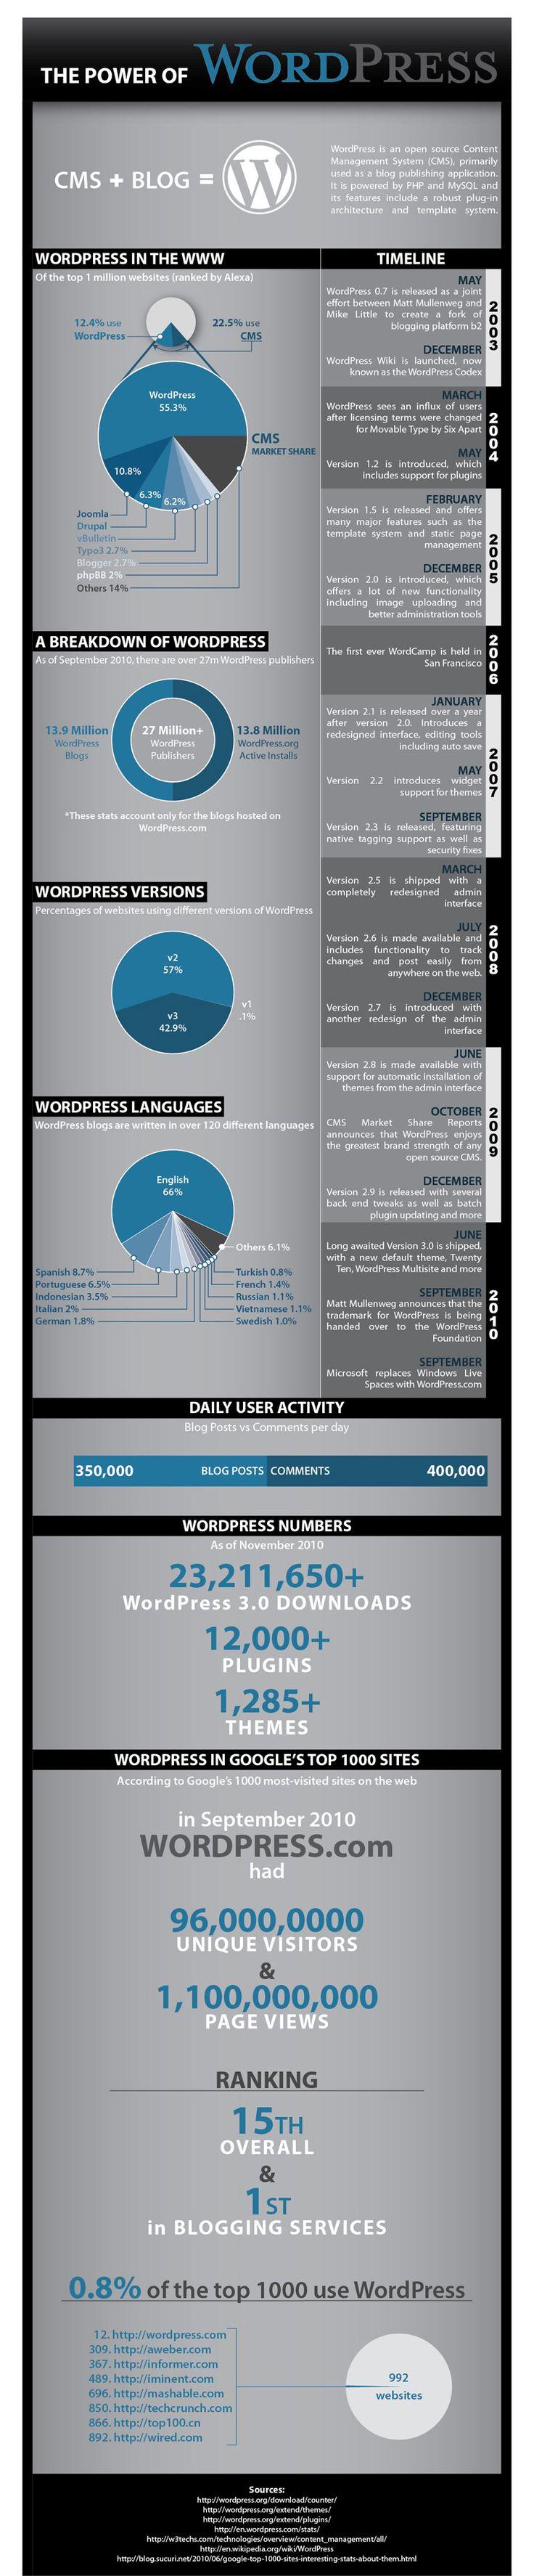 195 best WordPress Information images on Pinterest | Design web ...